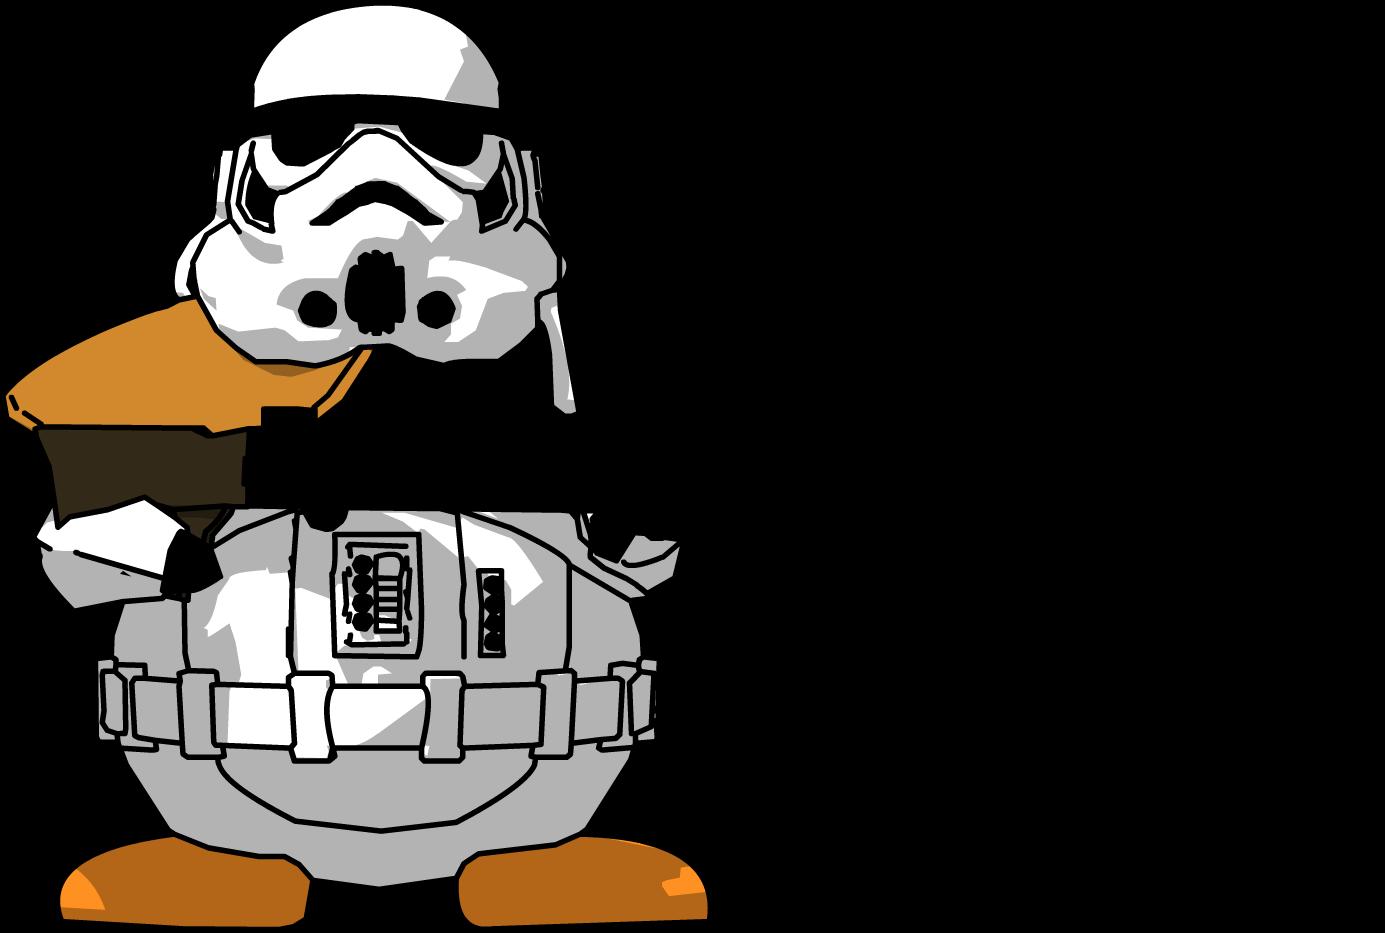 Star wars blaster clipart banner free stock Image - Starwars 2013 Game Shooter Boss.png | Club Penguin Wiki ... banner free stock